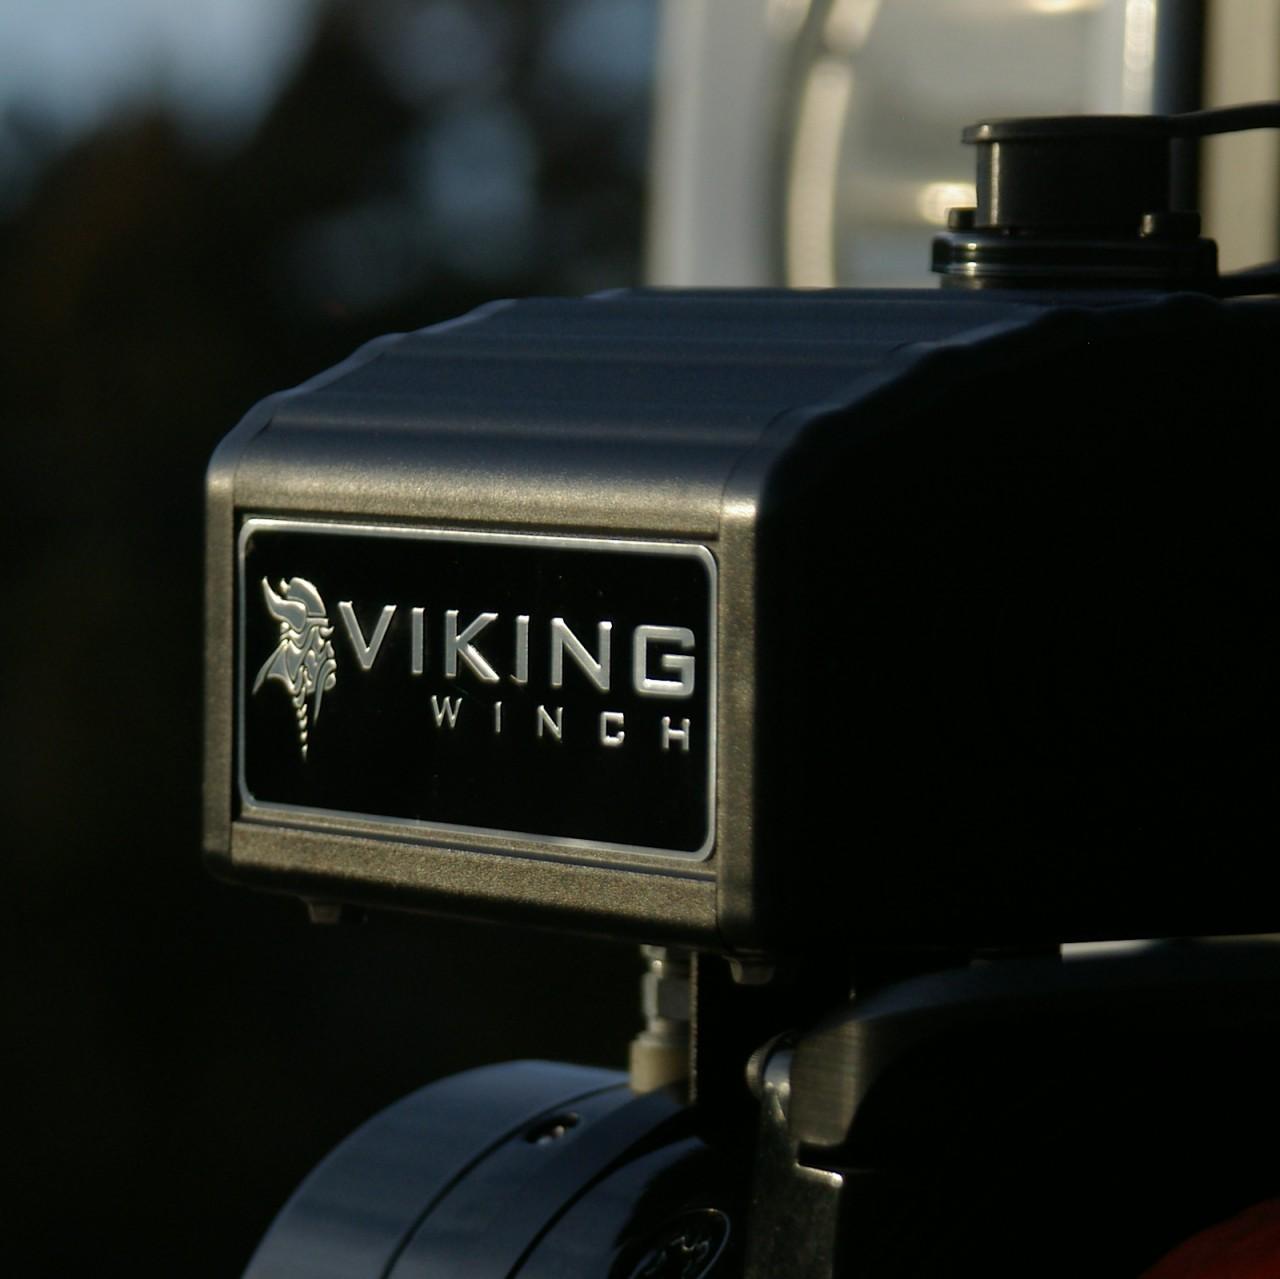 Viking Winch Close up